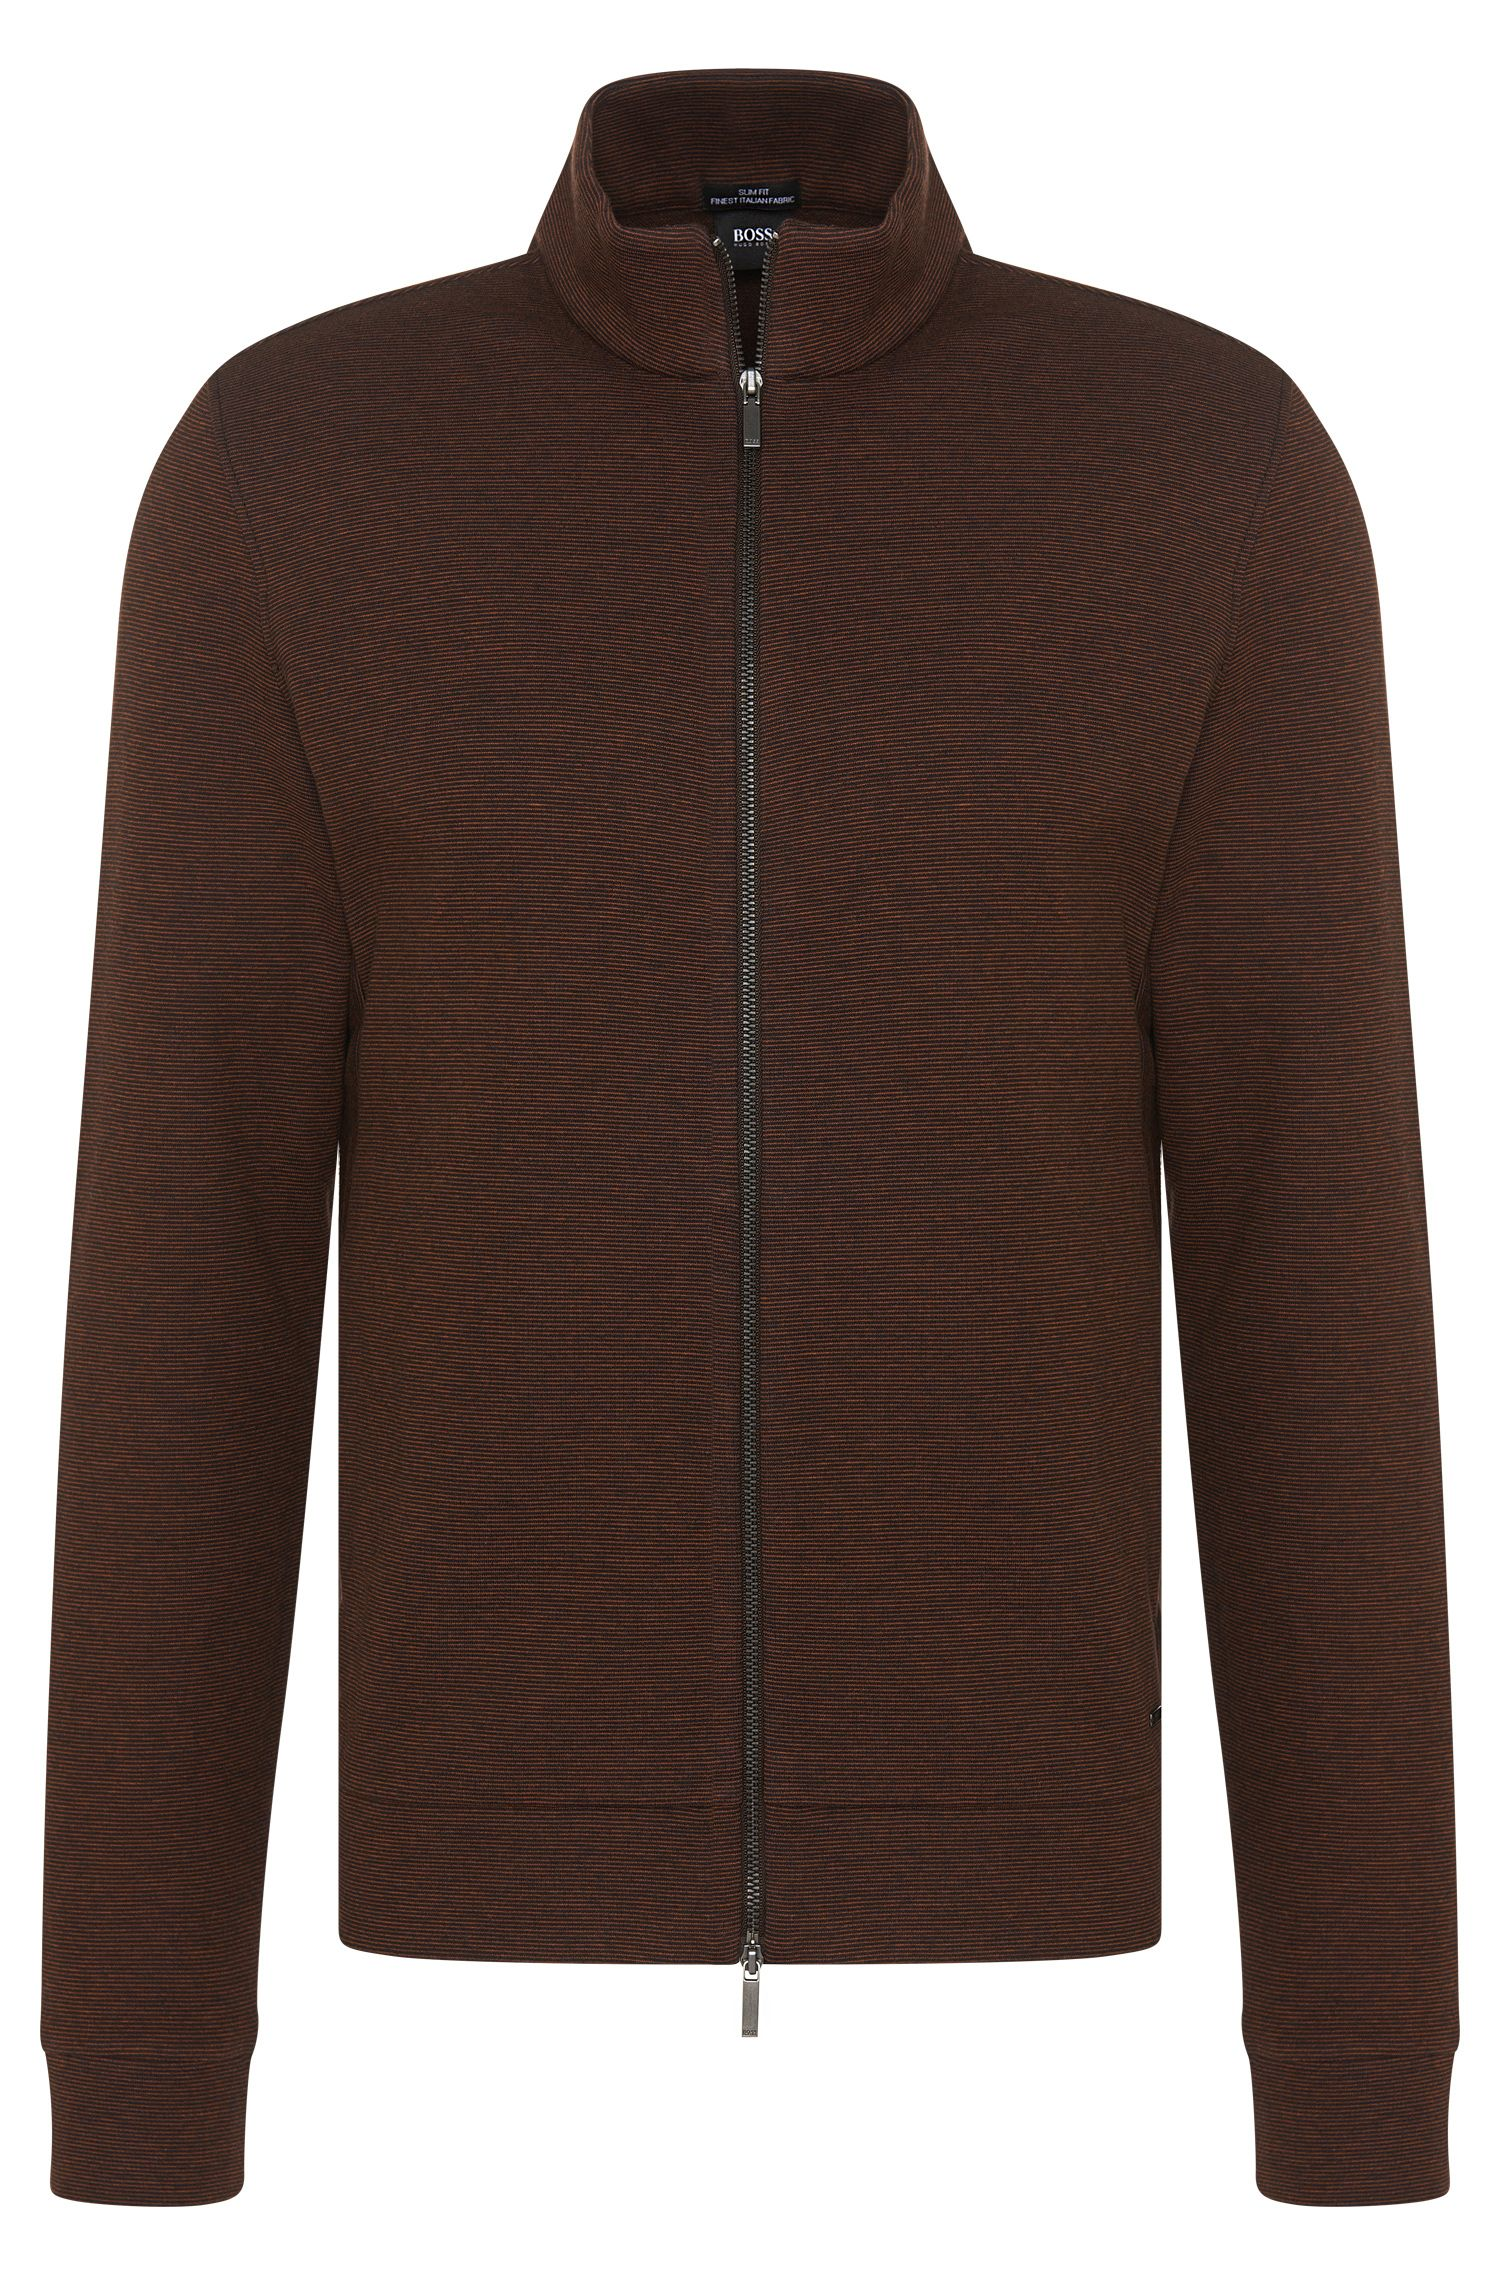 Striped slim-fit sweatshirt jacket in cotton blend with wool: 'Saldun 01'